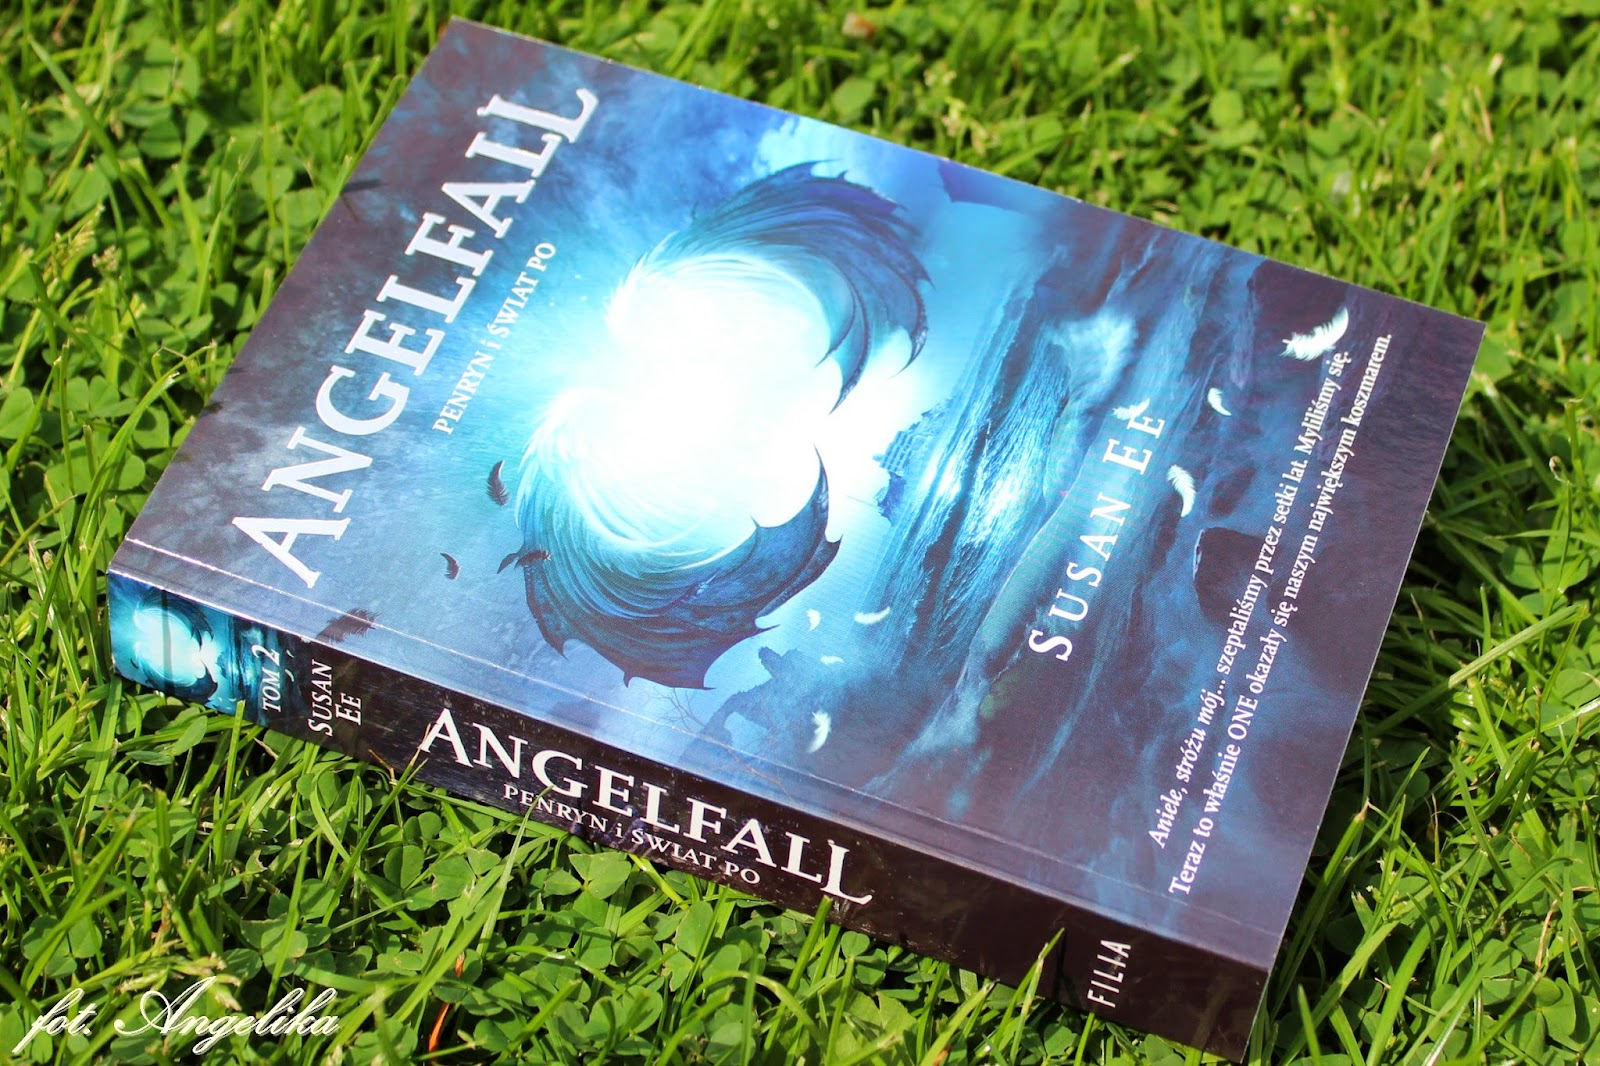 Angelfall. Penryn i Świat Po –  tom II Thriller fantasy w wykonaniu Susan Ee